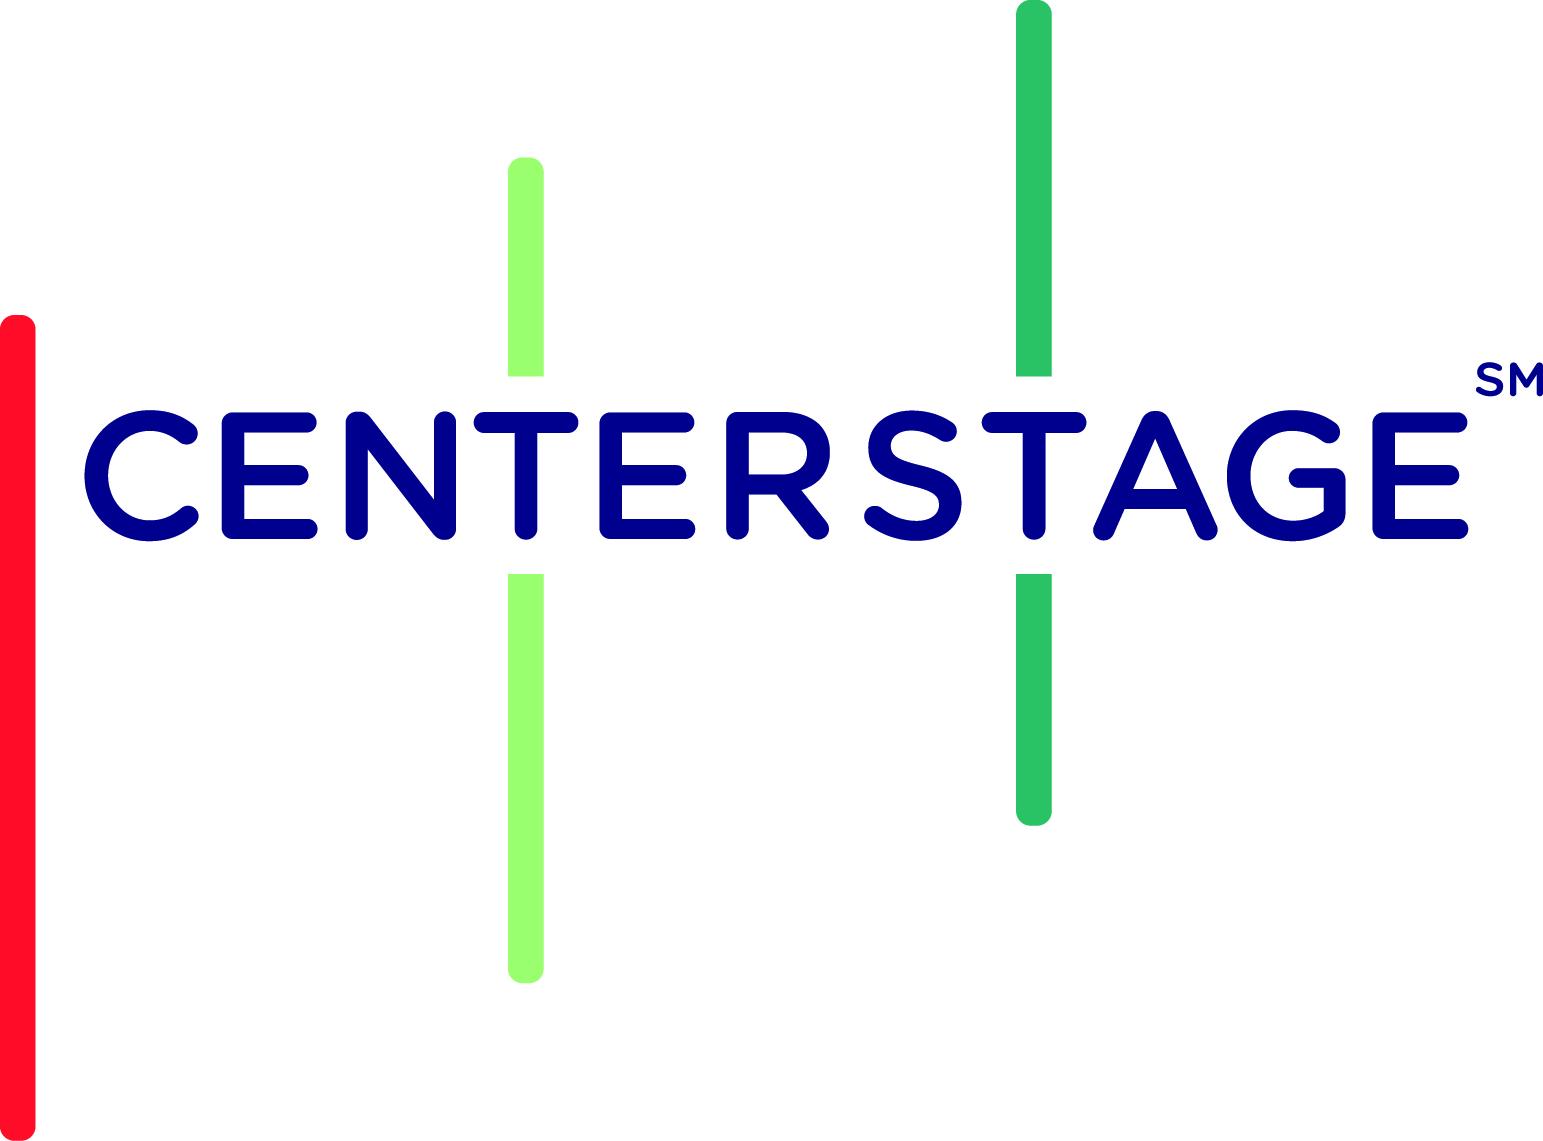 centerstage_logo_fullcolor.jpg